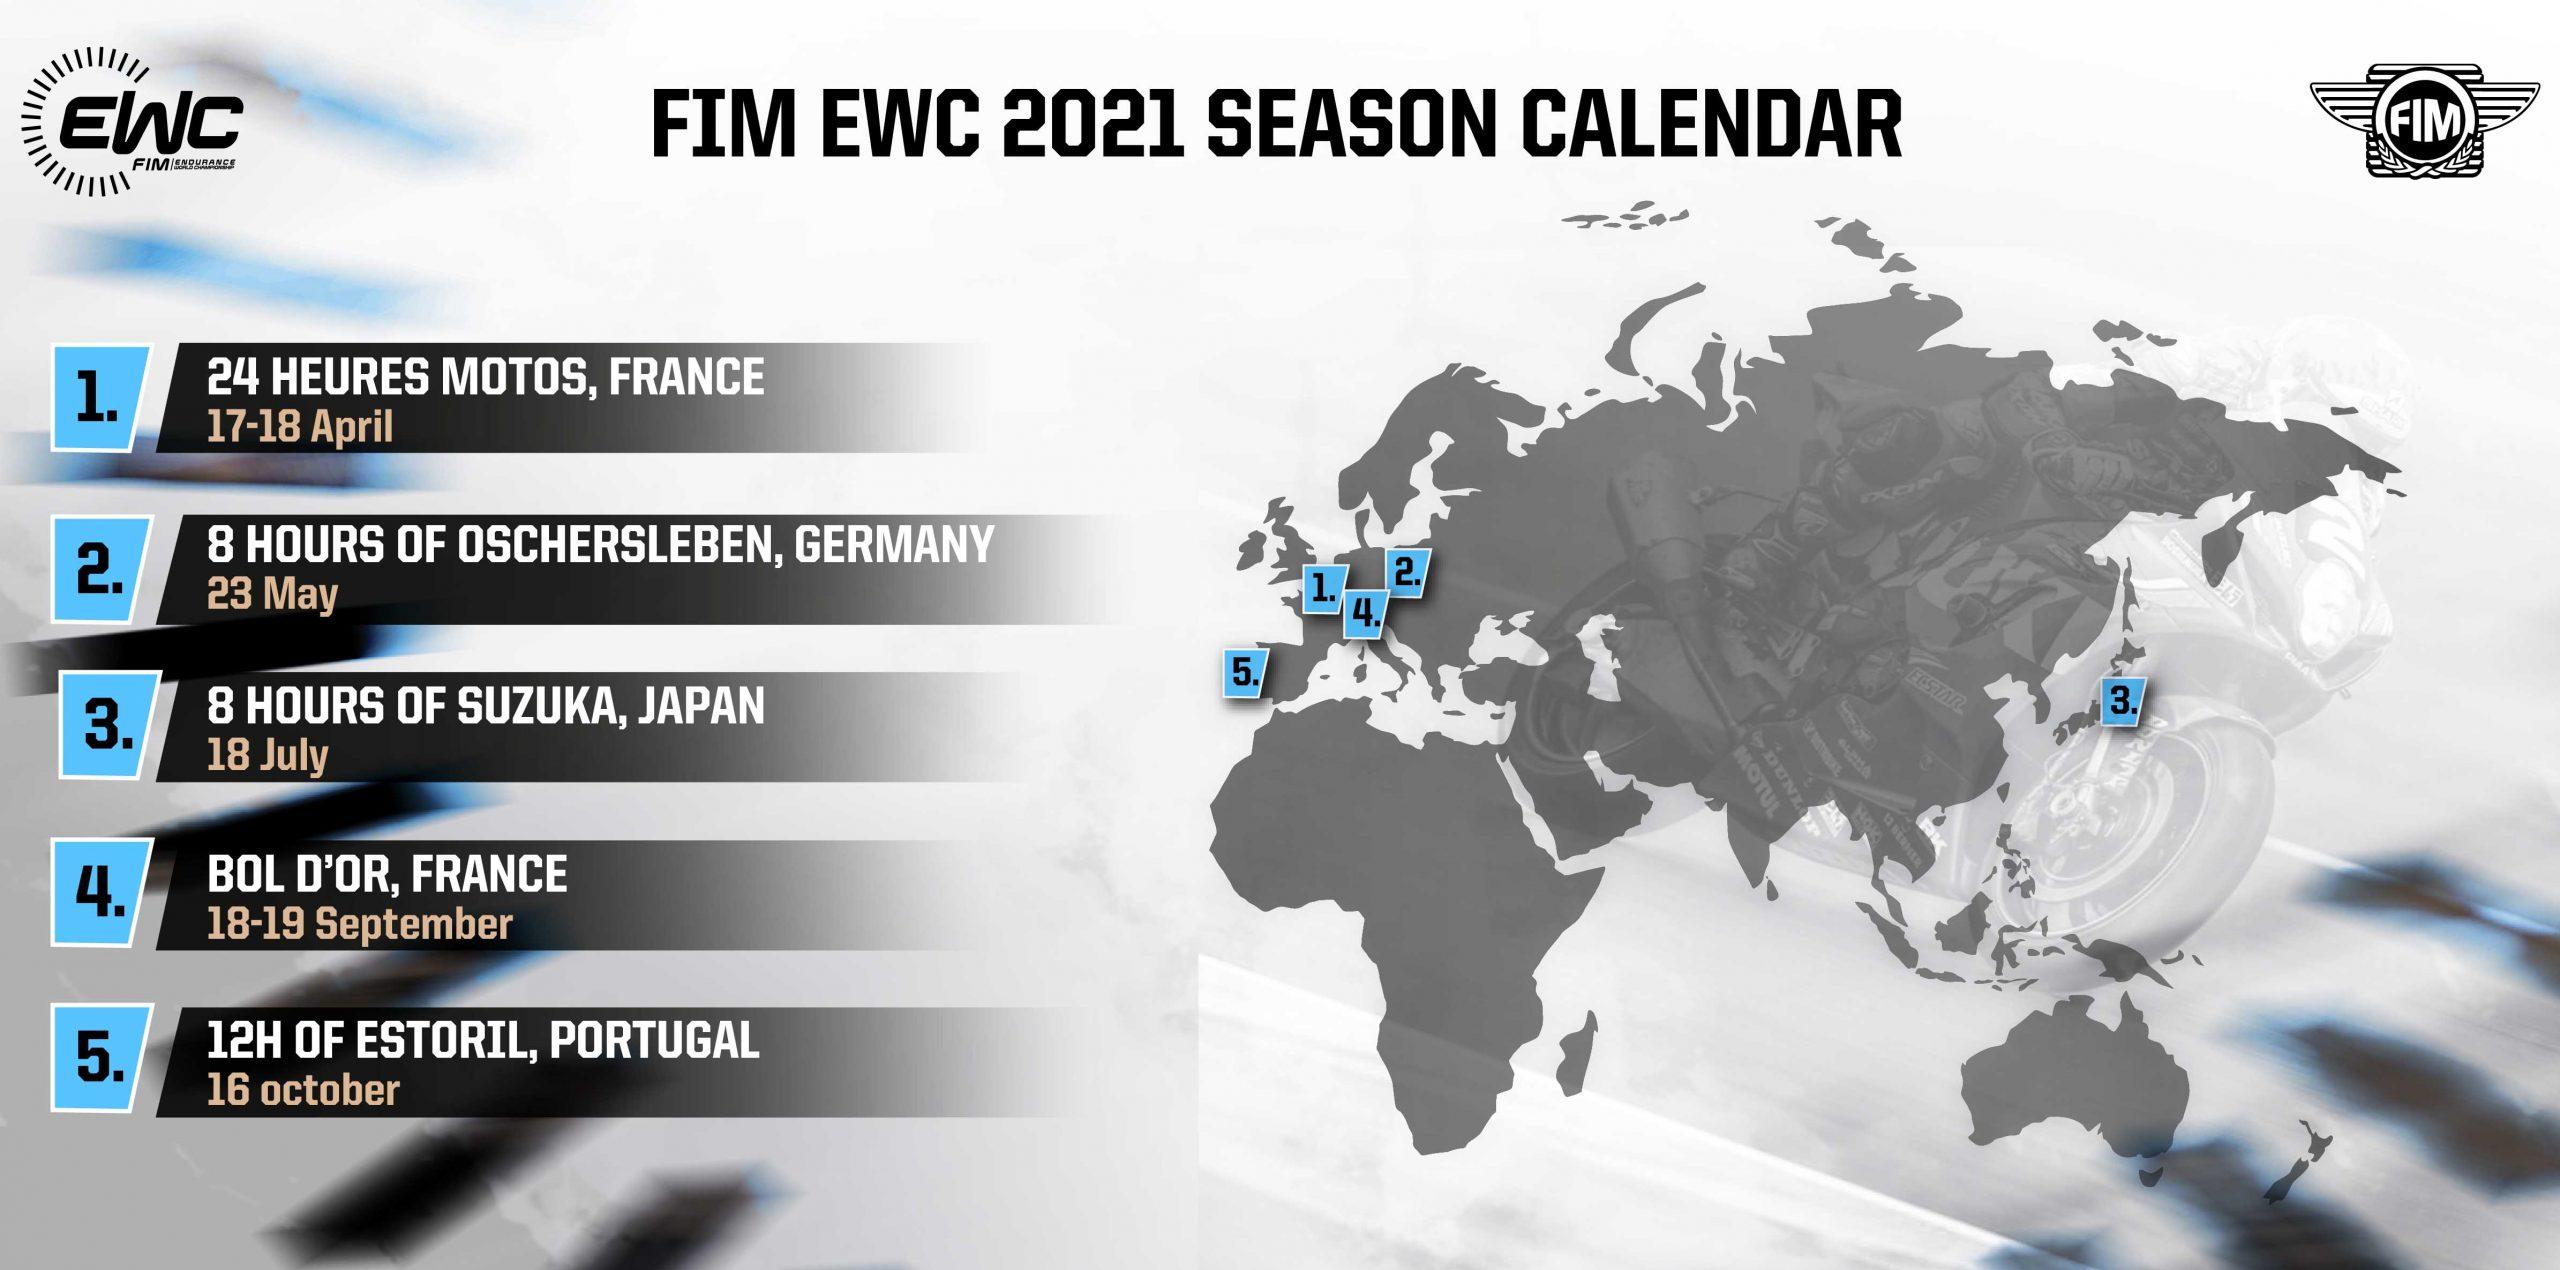 2021 FIMEWC